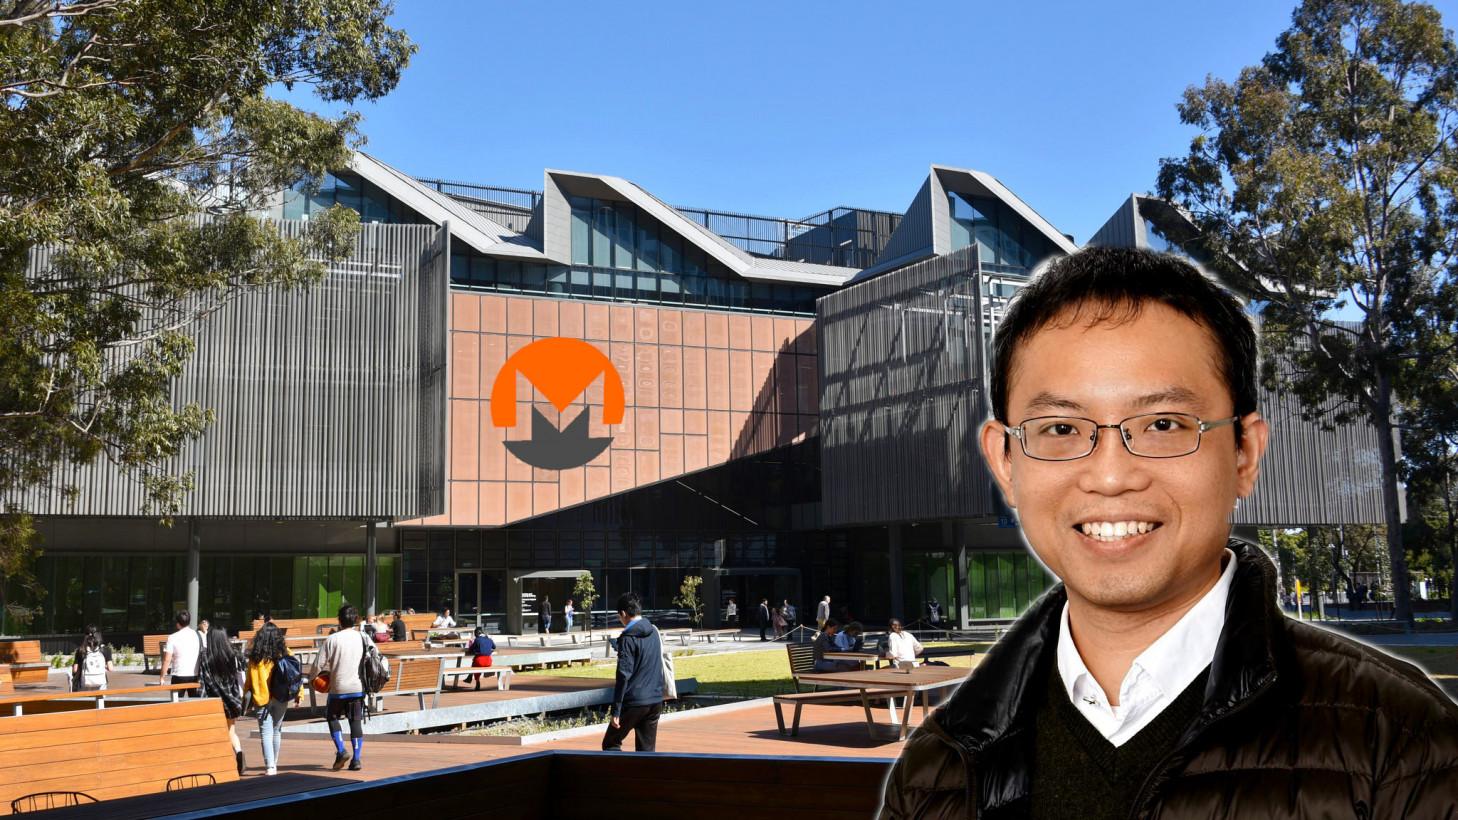 thenextweb.com - David Canellis - Researcher behind Monero's crypto system awarded prestigious prize